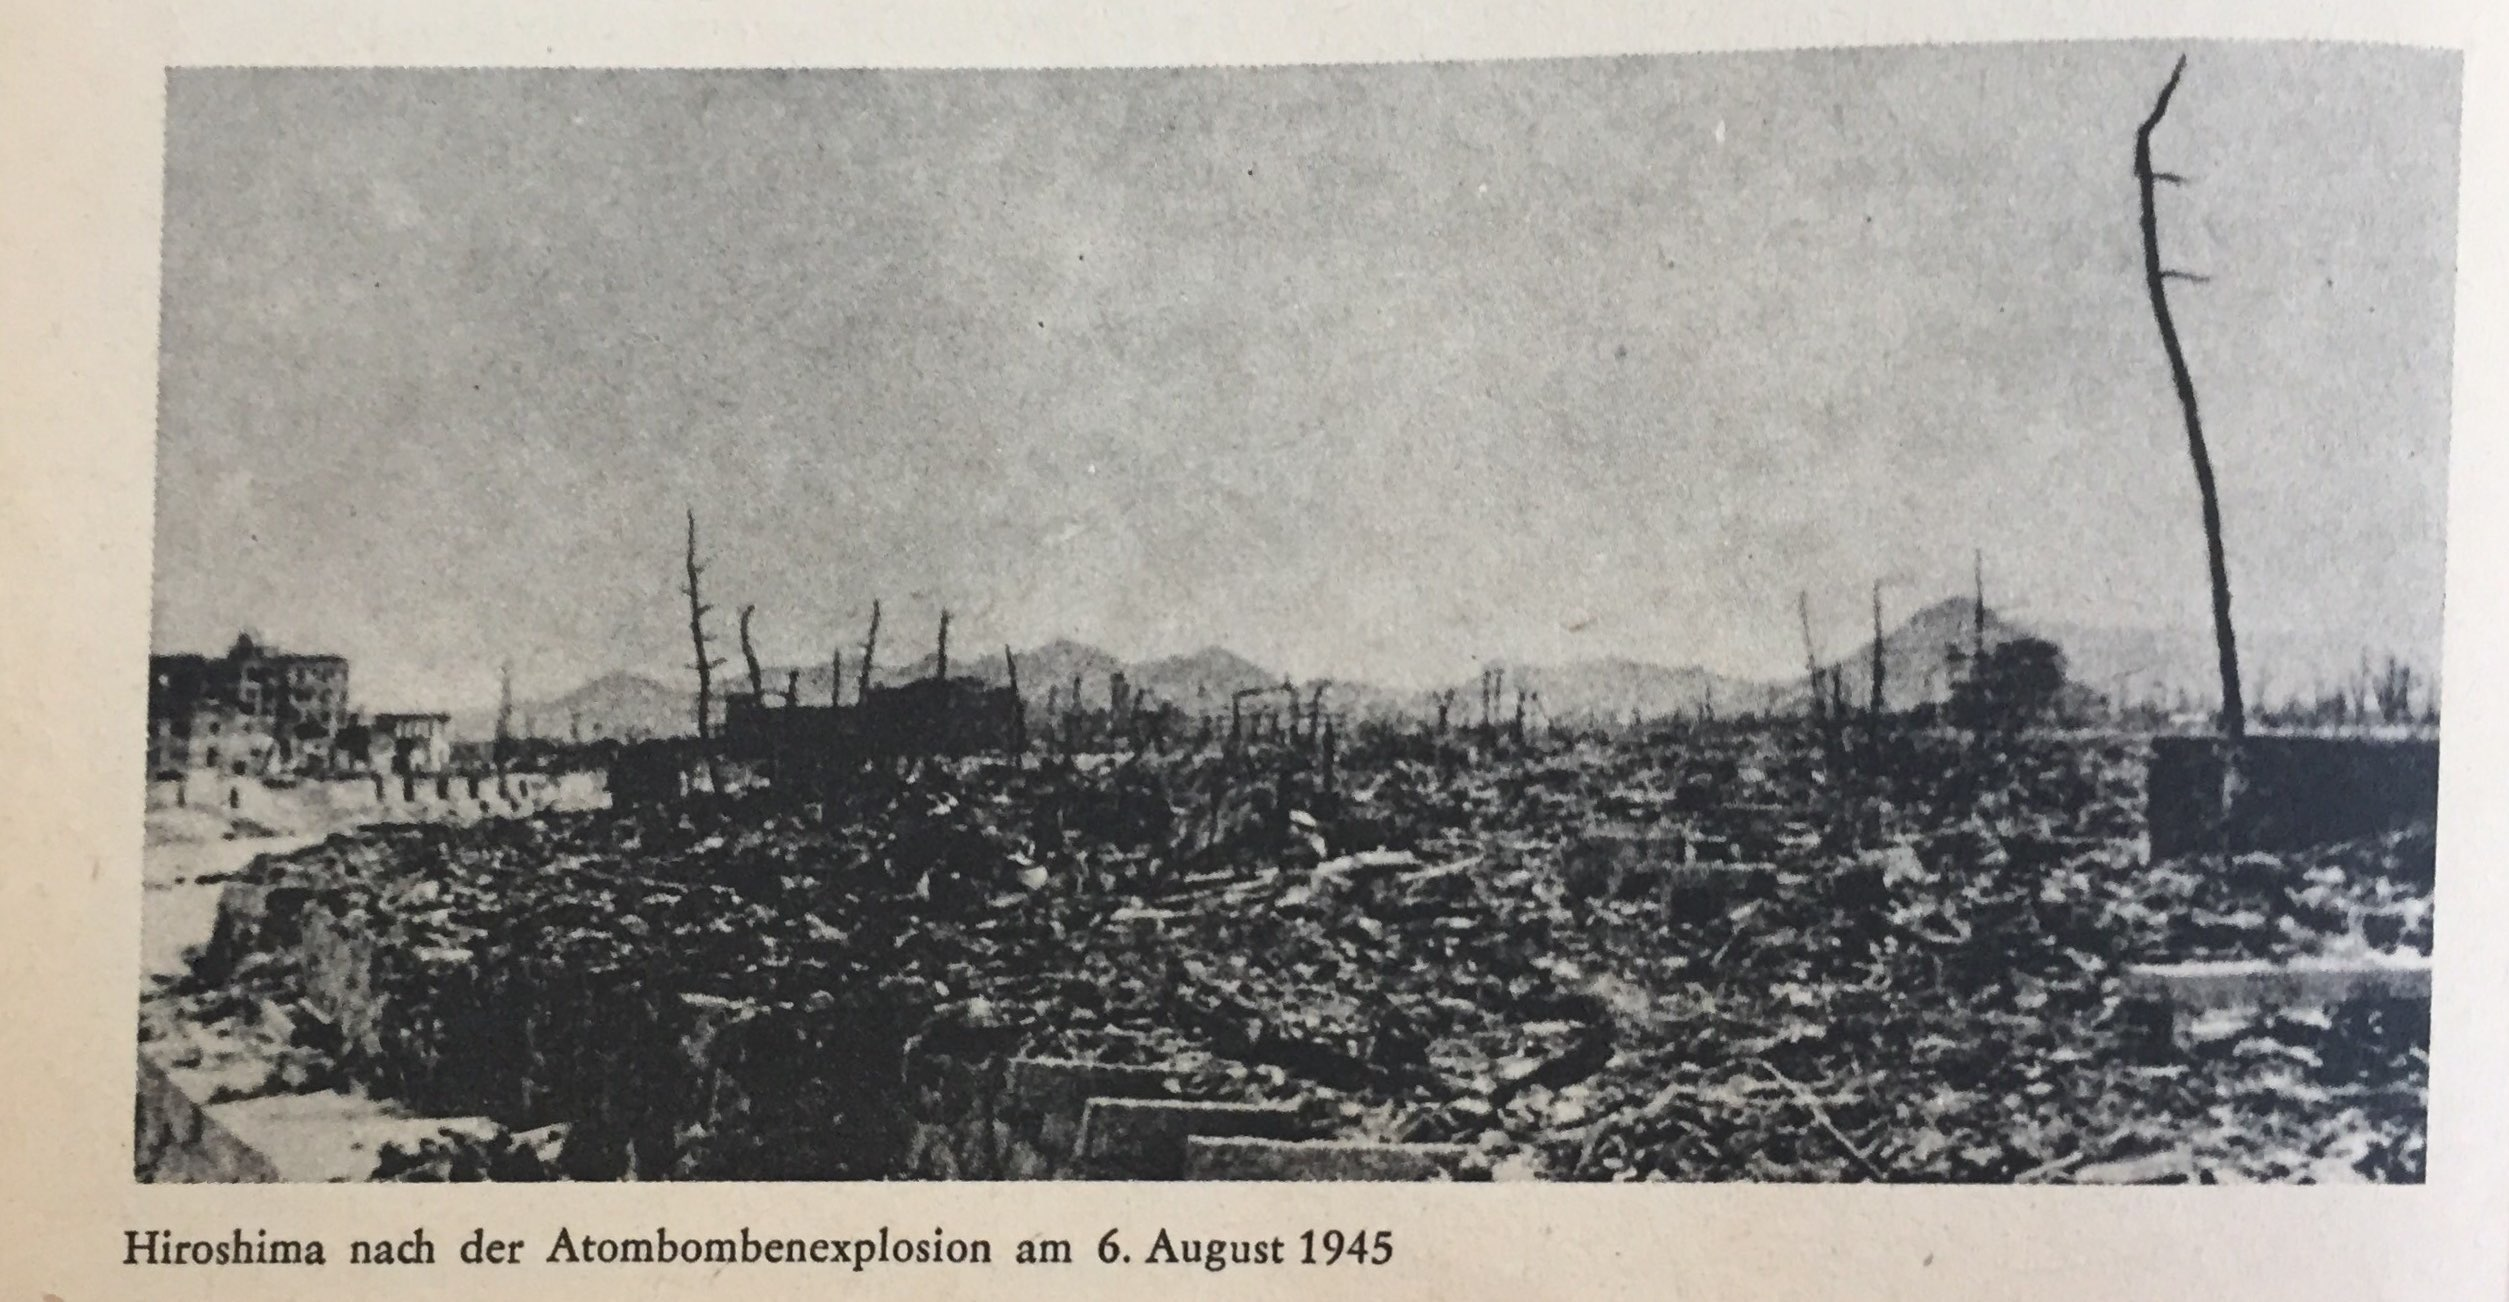 Hiroschima nach Atombombenexplosion